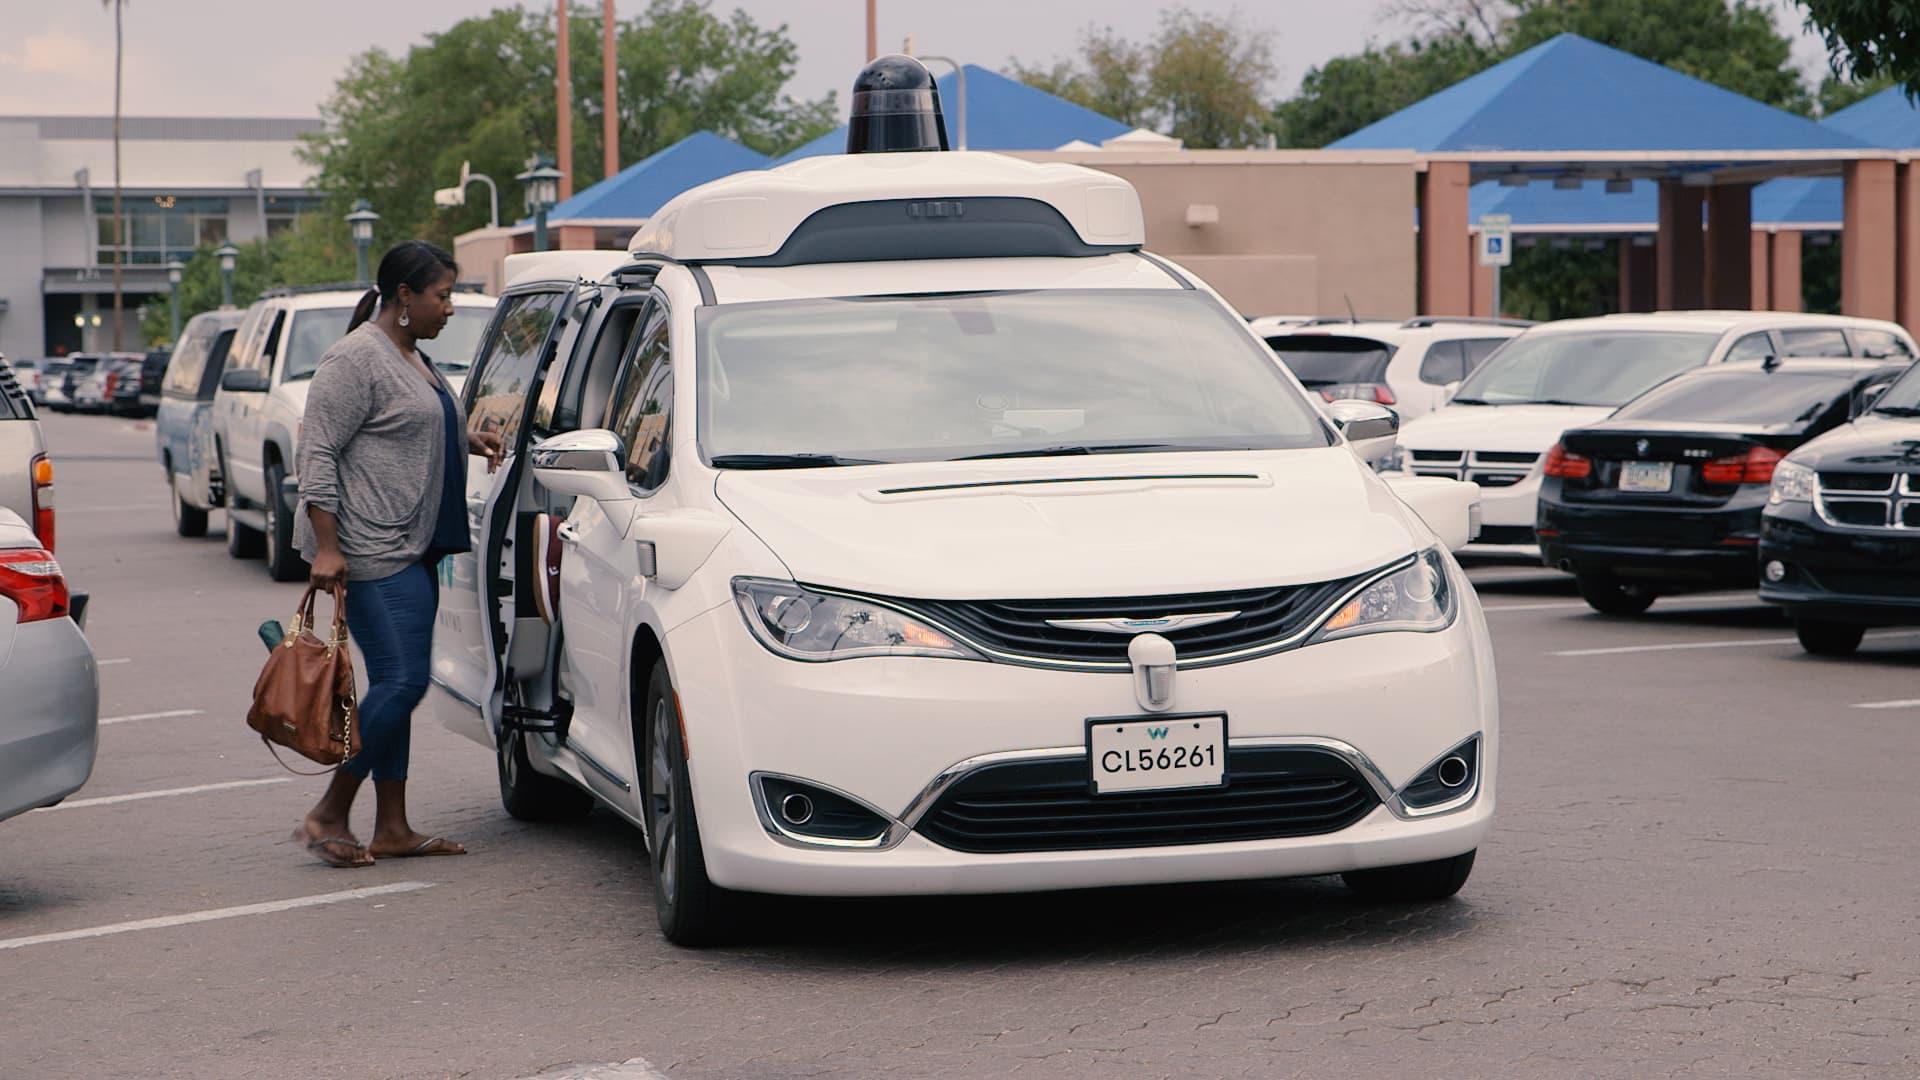 Alphabet Waymo self-driving tech needs more humans